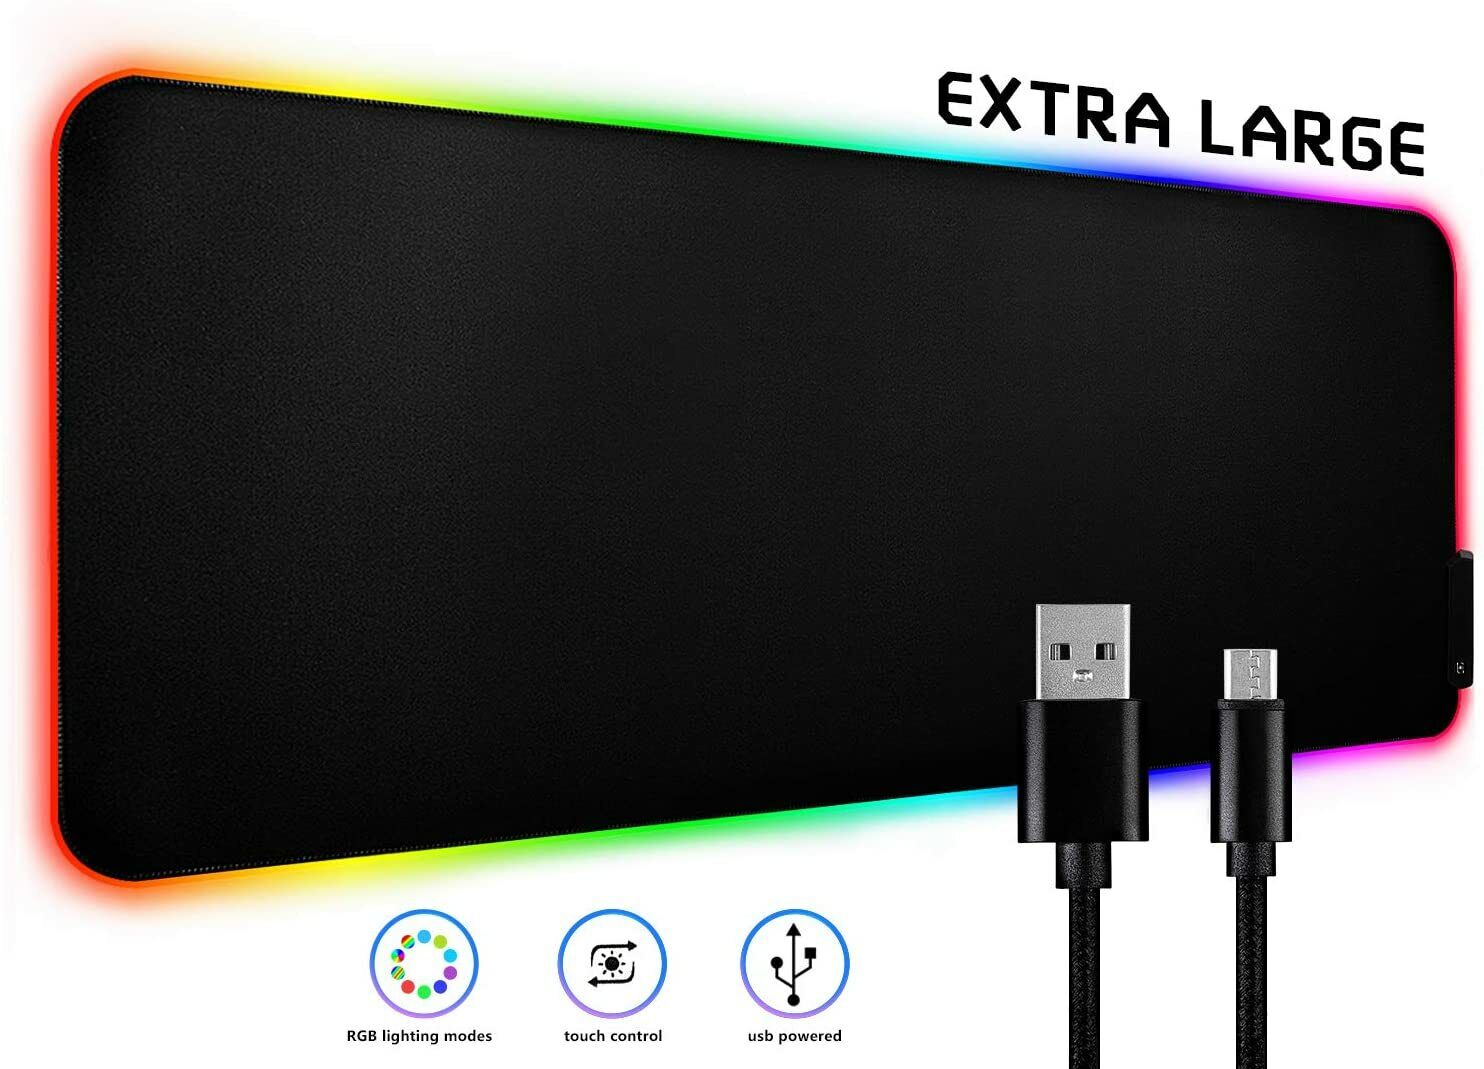 LED Extra Large Gaming Mouse Pad RGB Oversized Glowing 10 Co